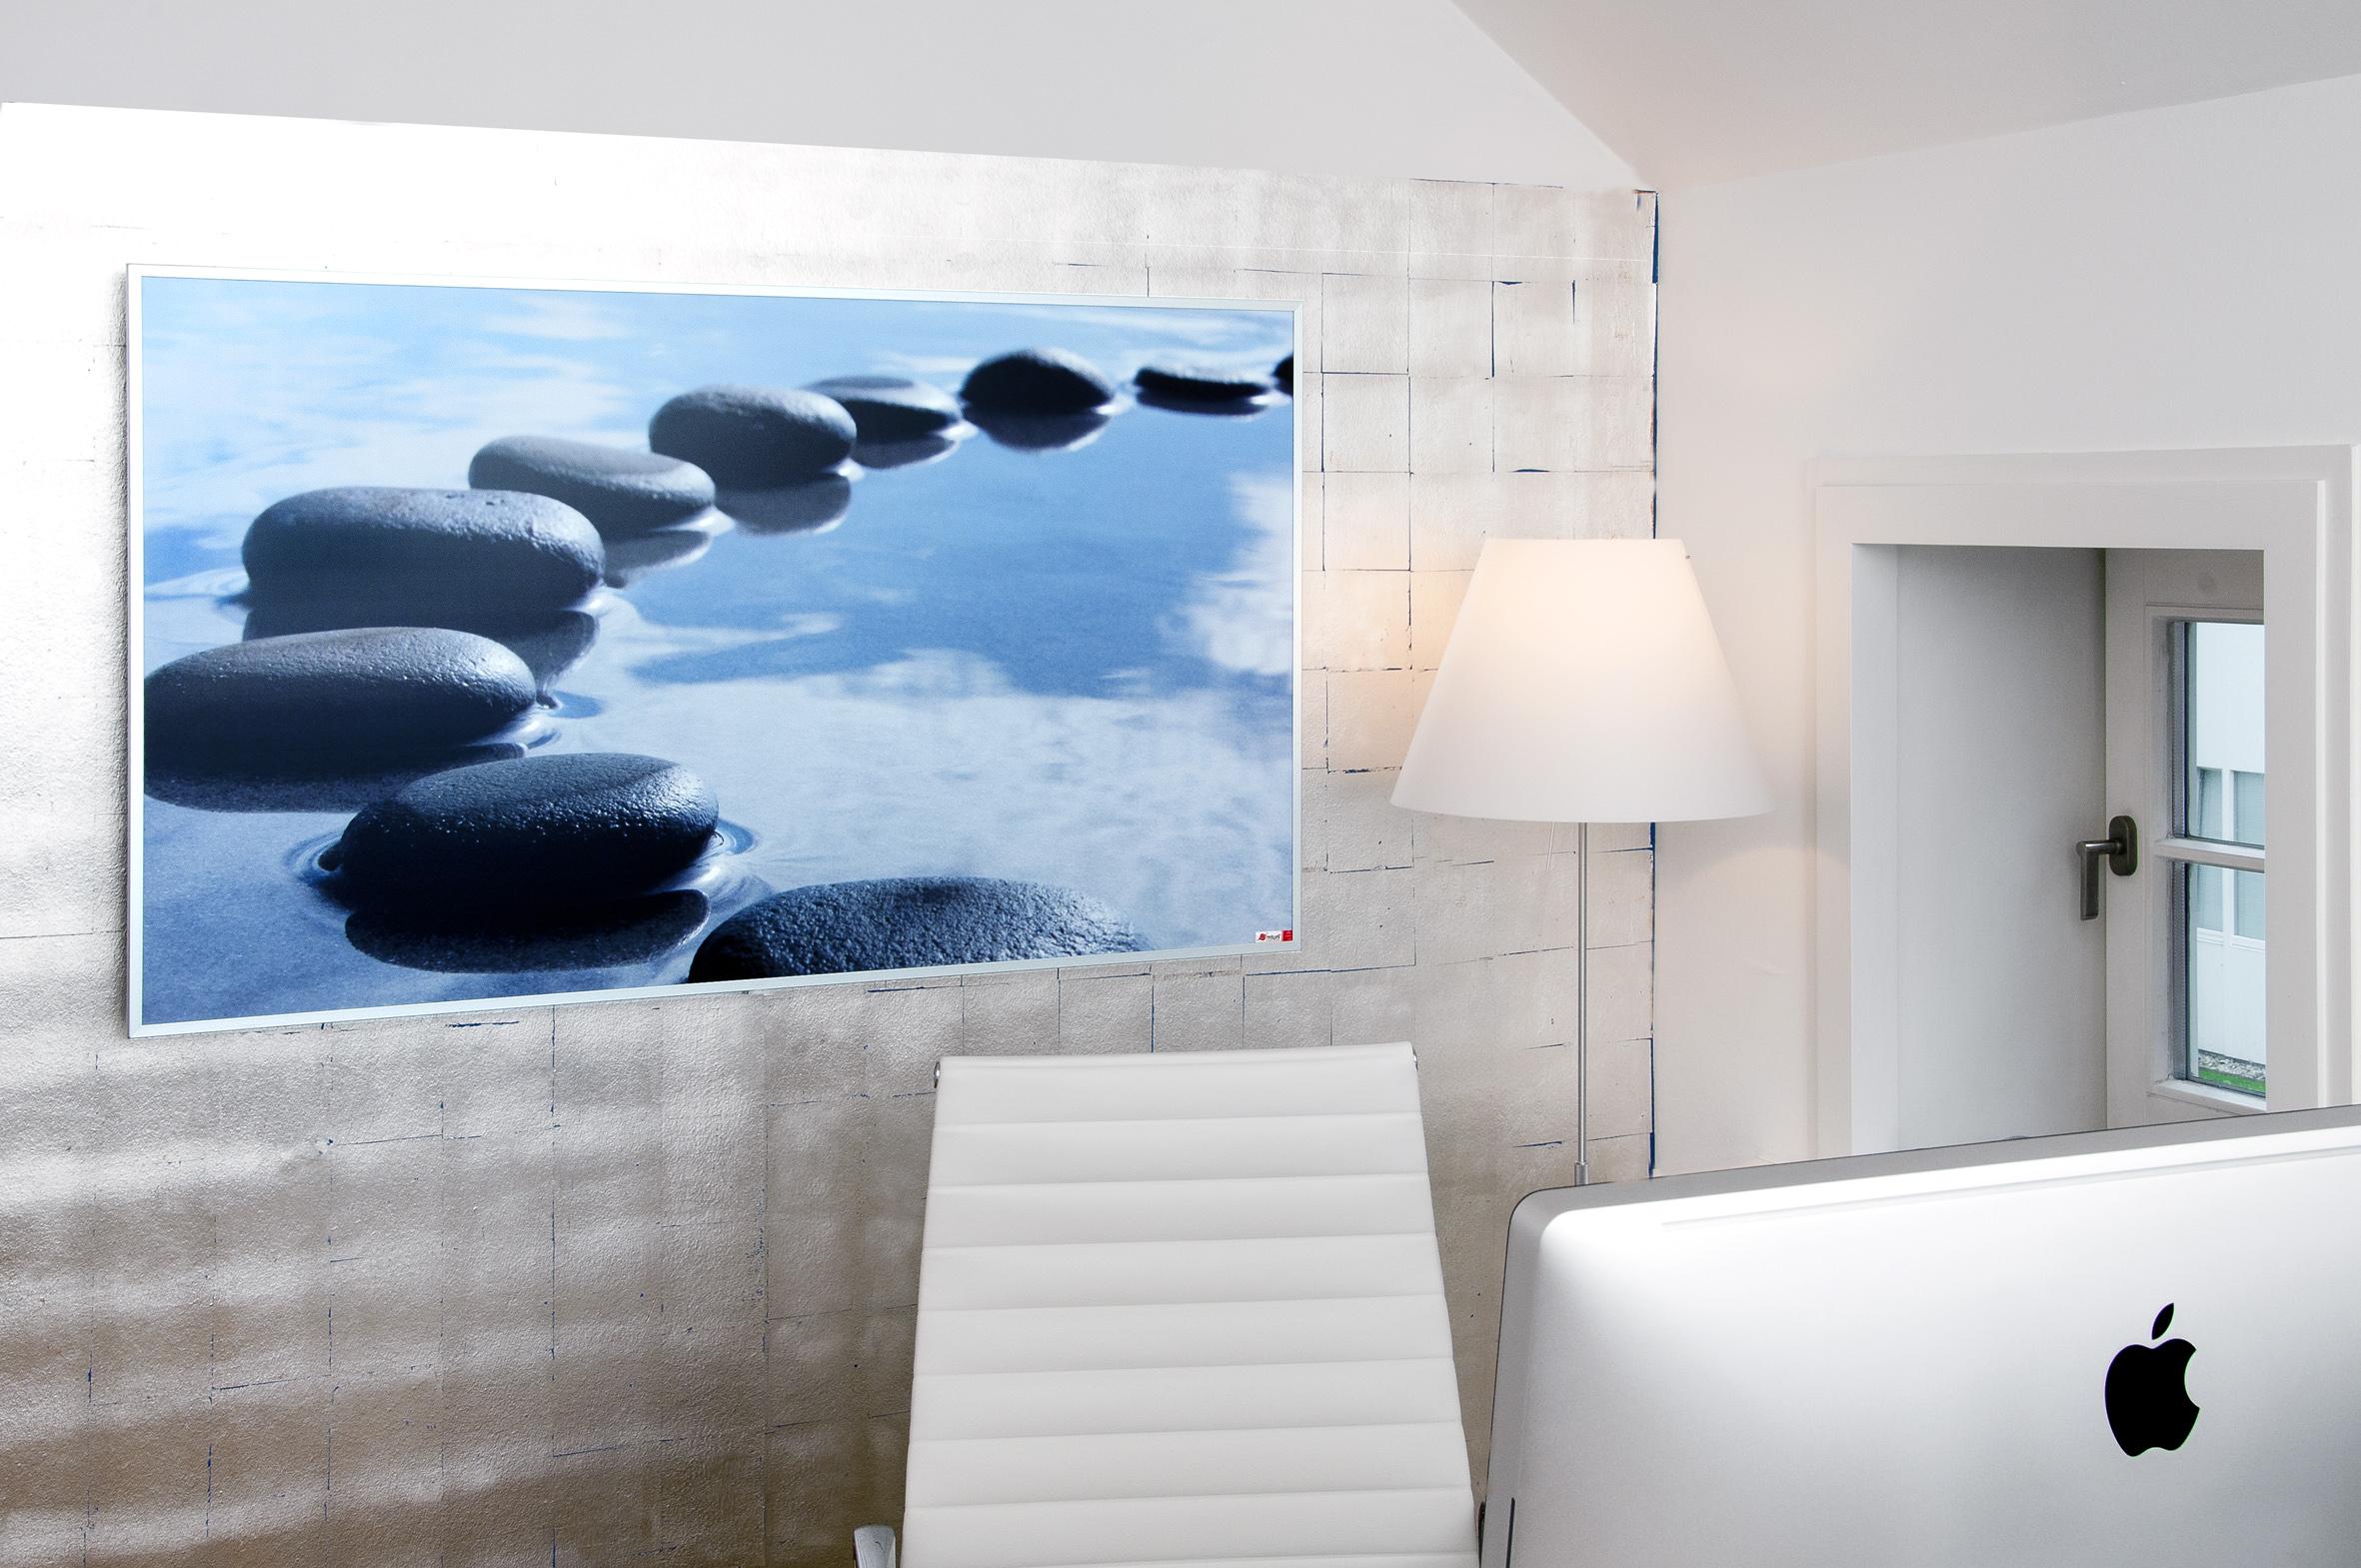 infrarotheizungen tipps zur wattzahl platzierung raumgr e. Black Bedroom Furniture Sets. Home Design Ideas